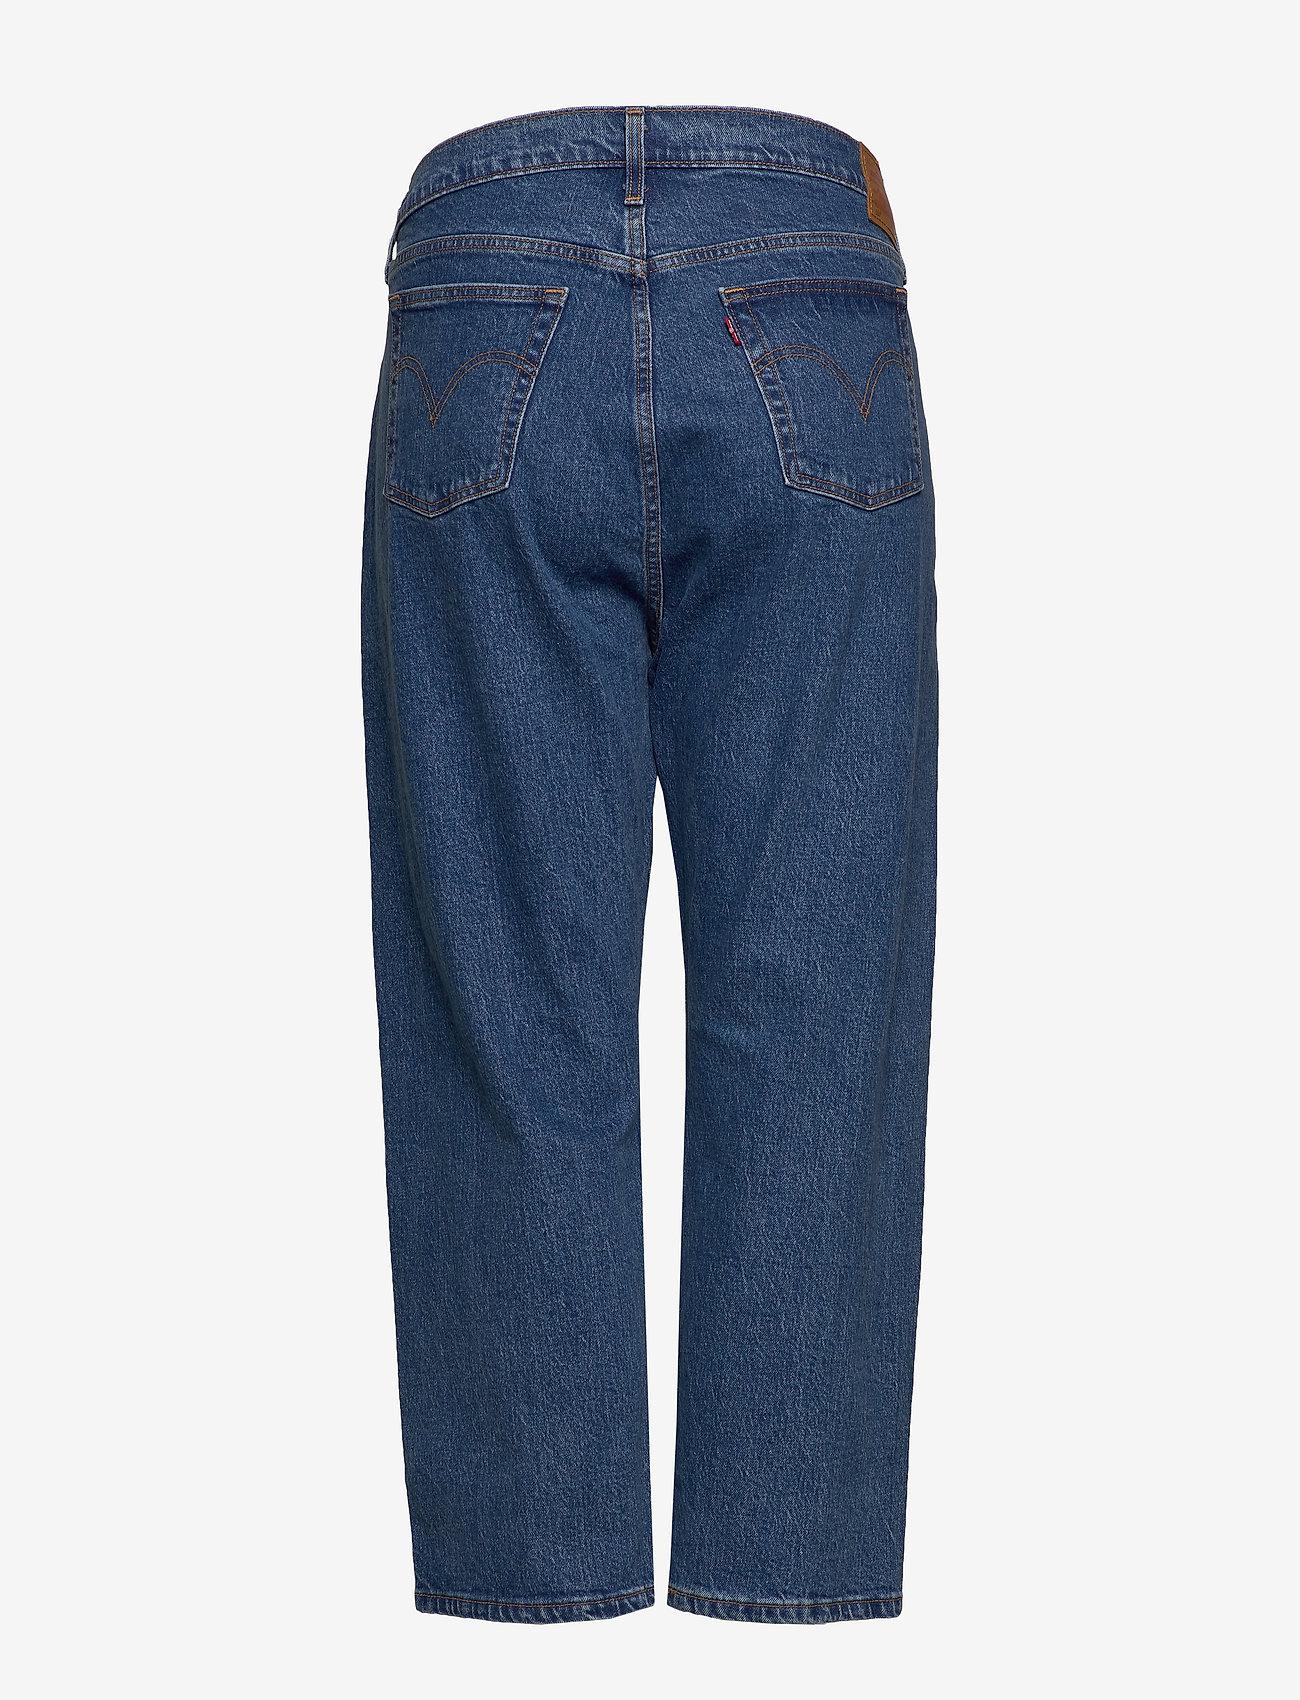 Levi's Plus Size - PL 501 CROP JIVE STONEWASH - straight jeans - med indigo - flat finish - 1